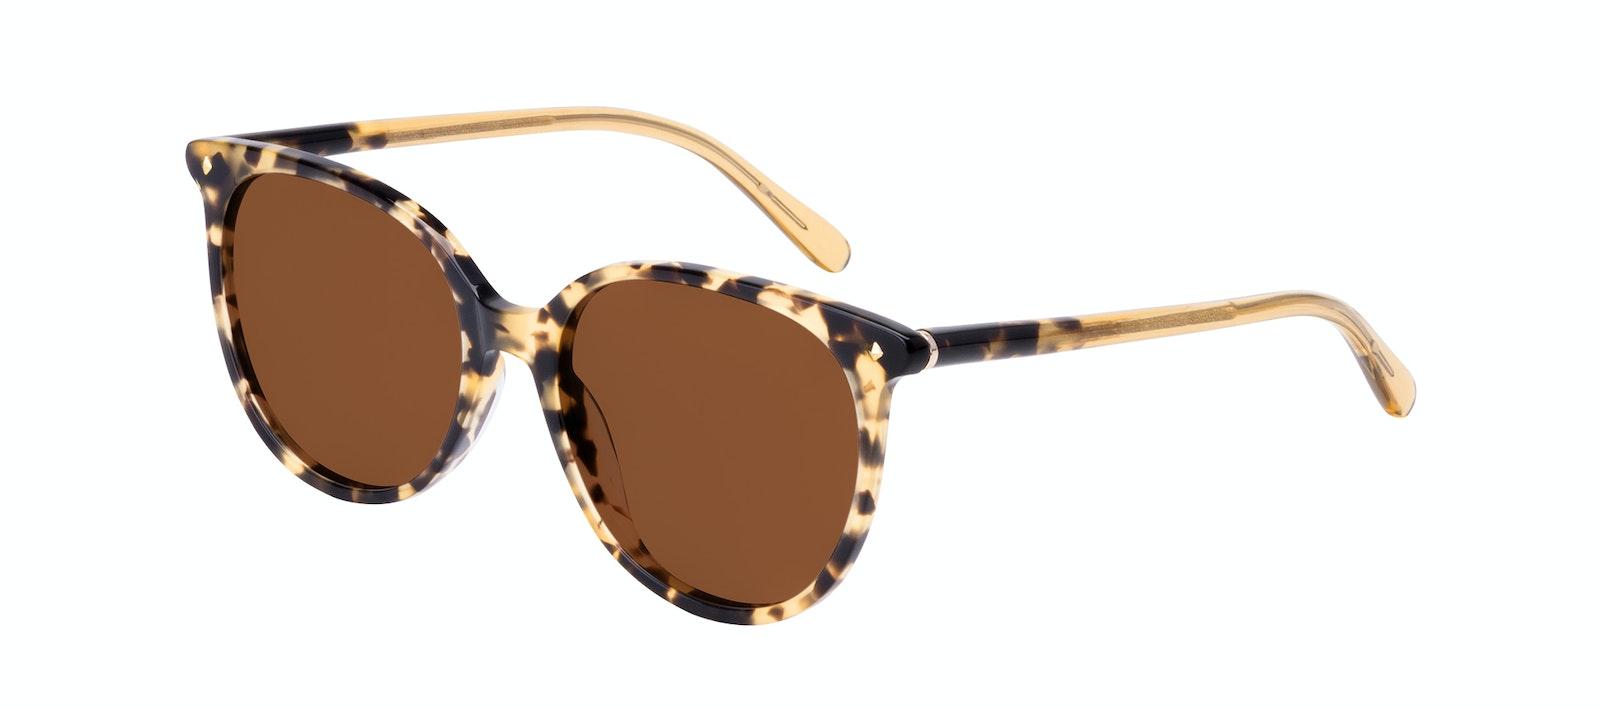 Affordable Fashion Glasses Round Sunglasses Women Area Petite Bingal Tilt